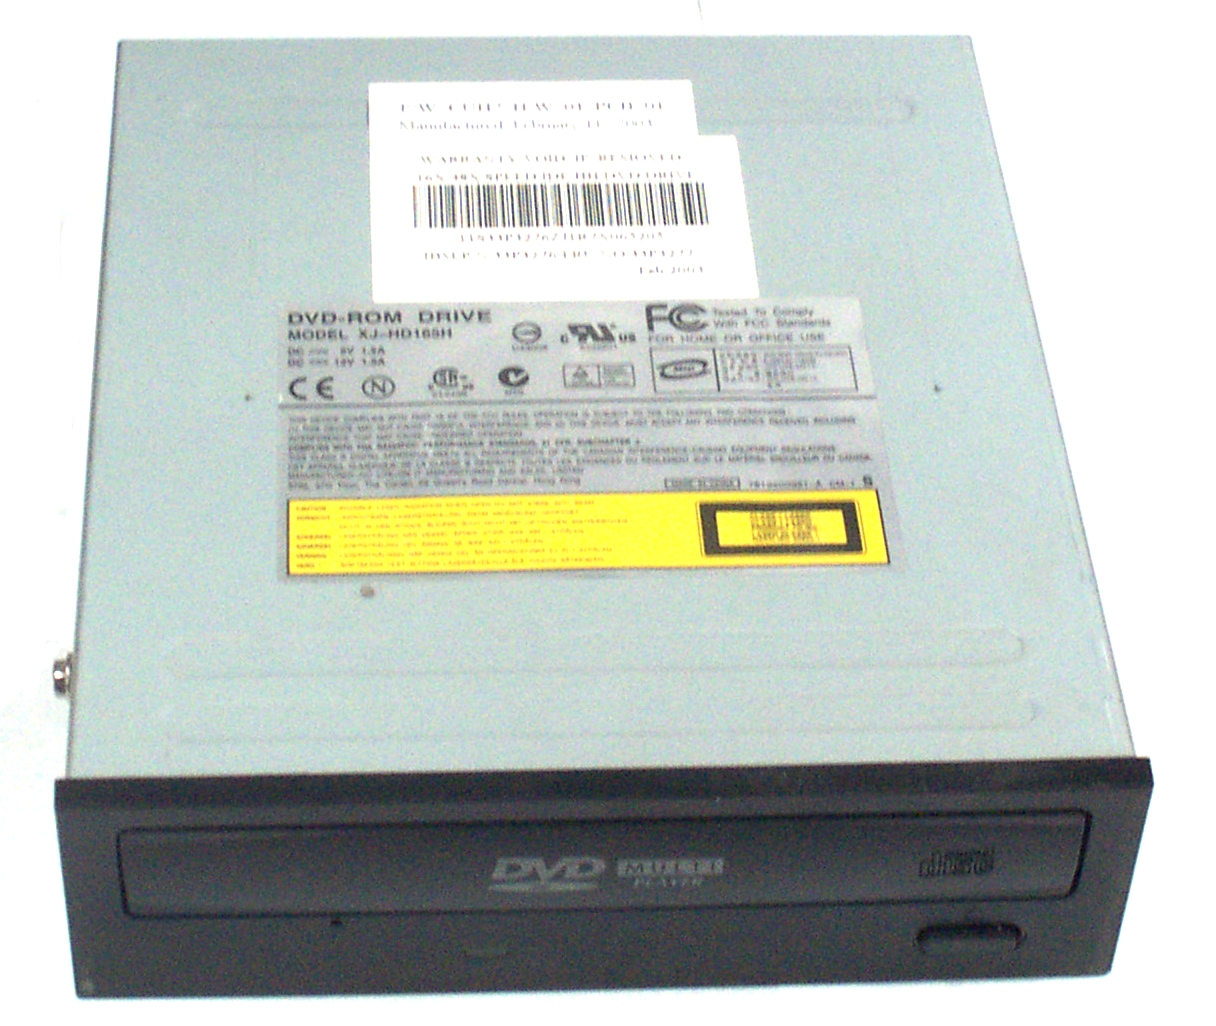 Dvd rom xj hd166 firmware